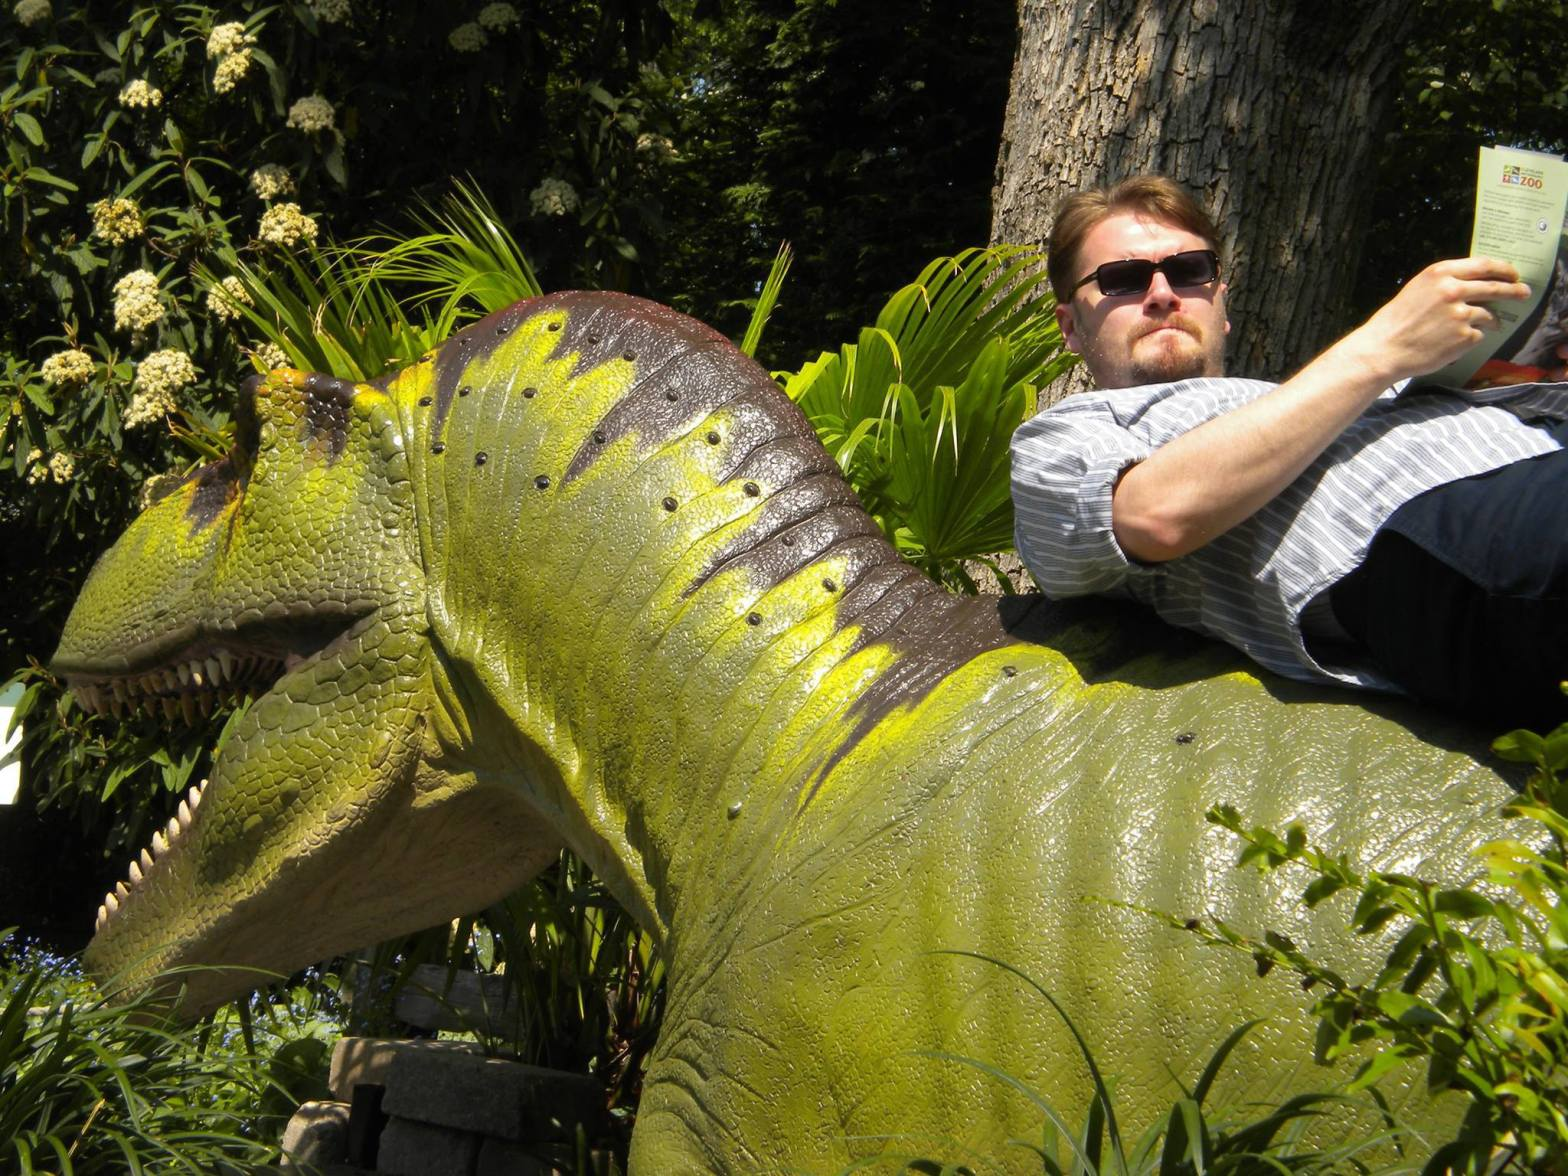 Alex Friedman sitting on top of a dinosaur.